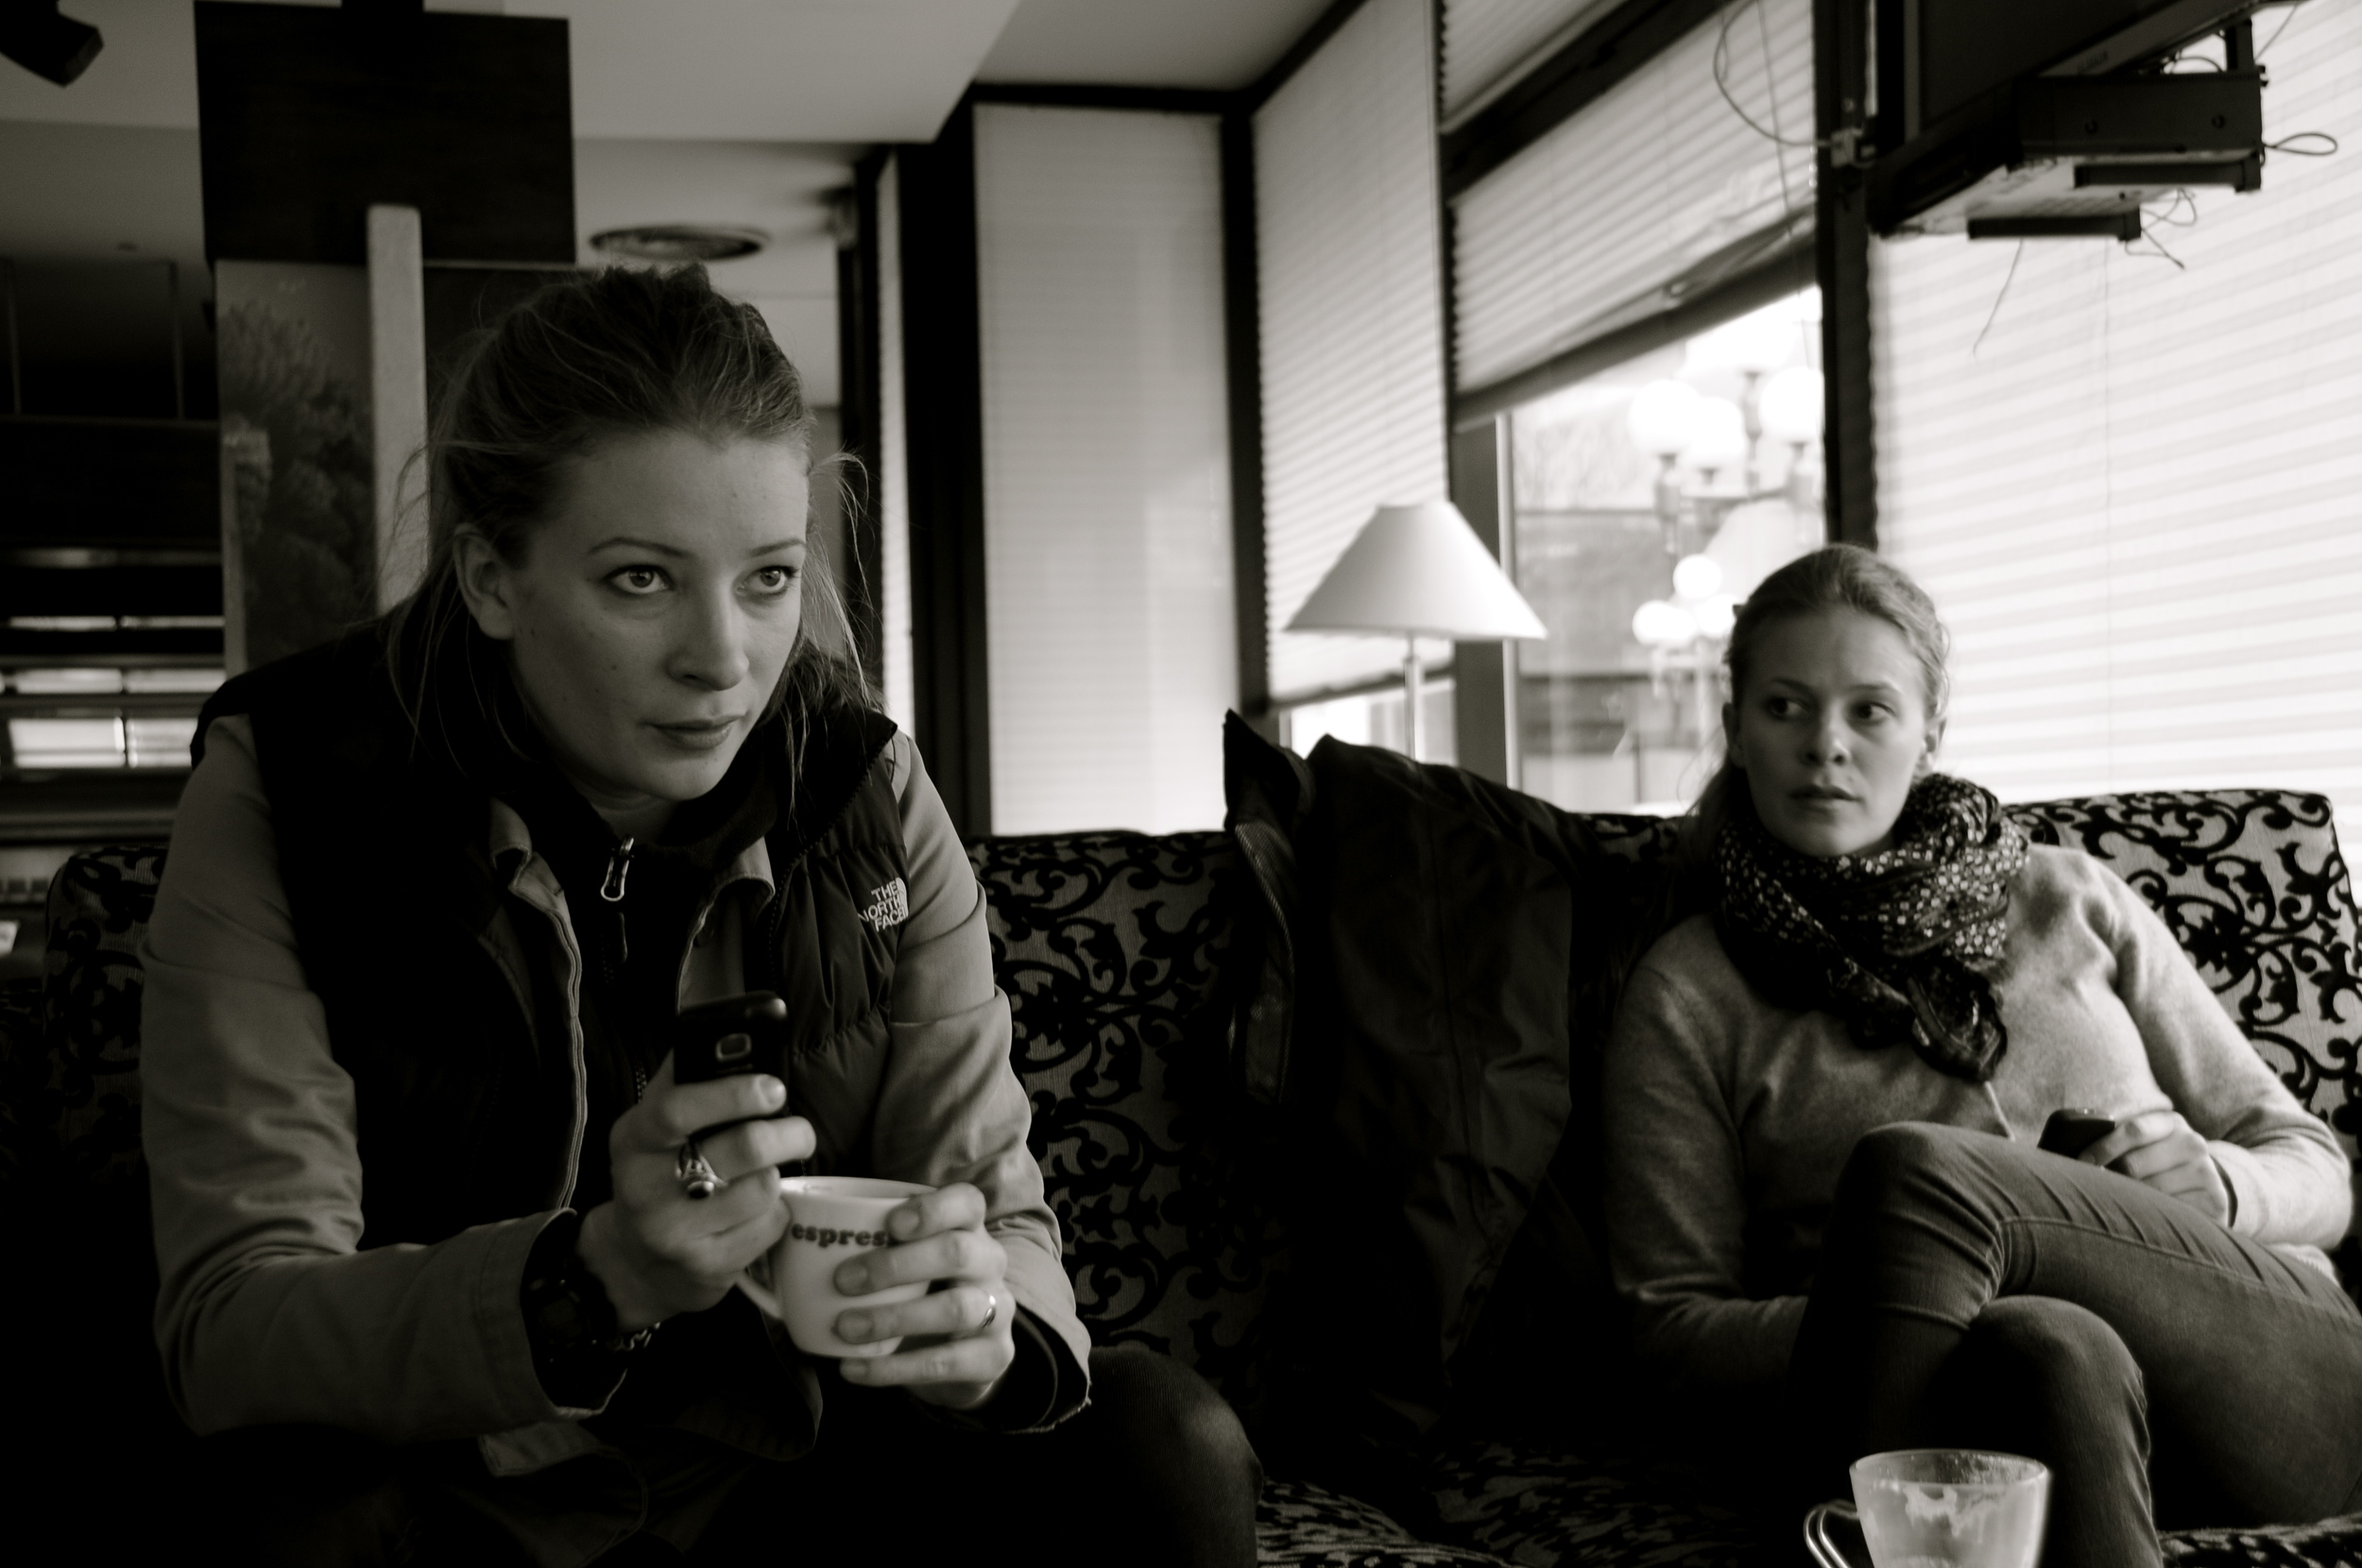 Sophia & Georgia Scott, Sarajevo November 2012